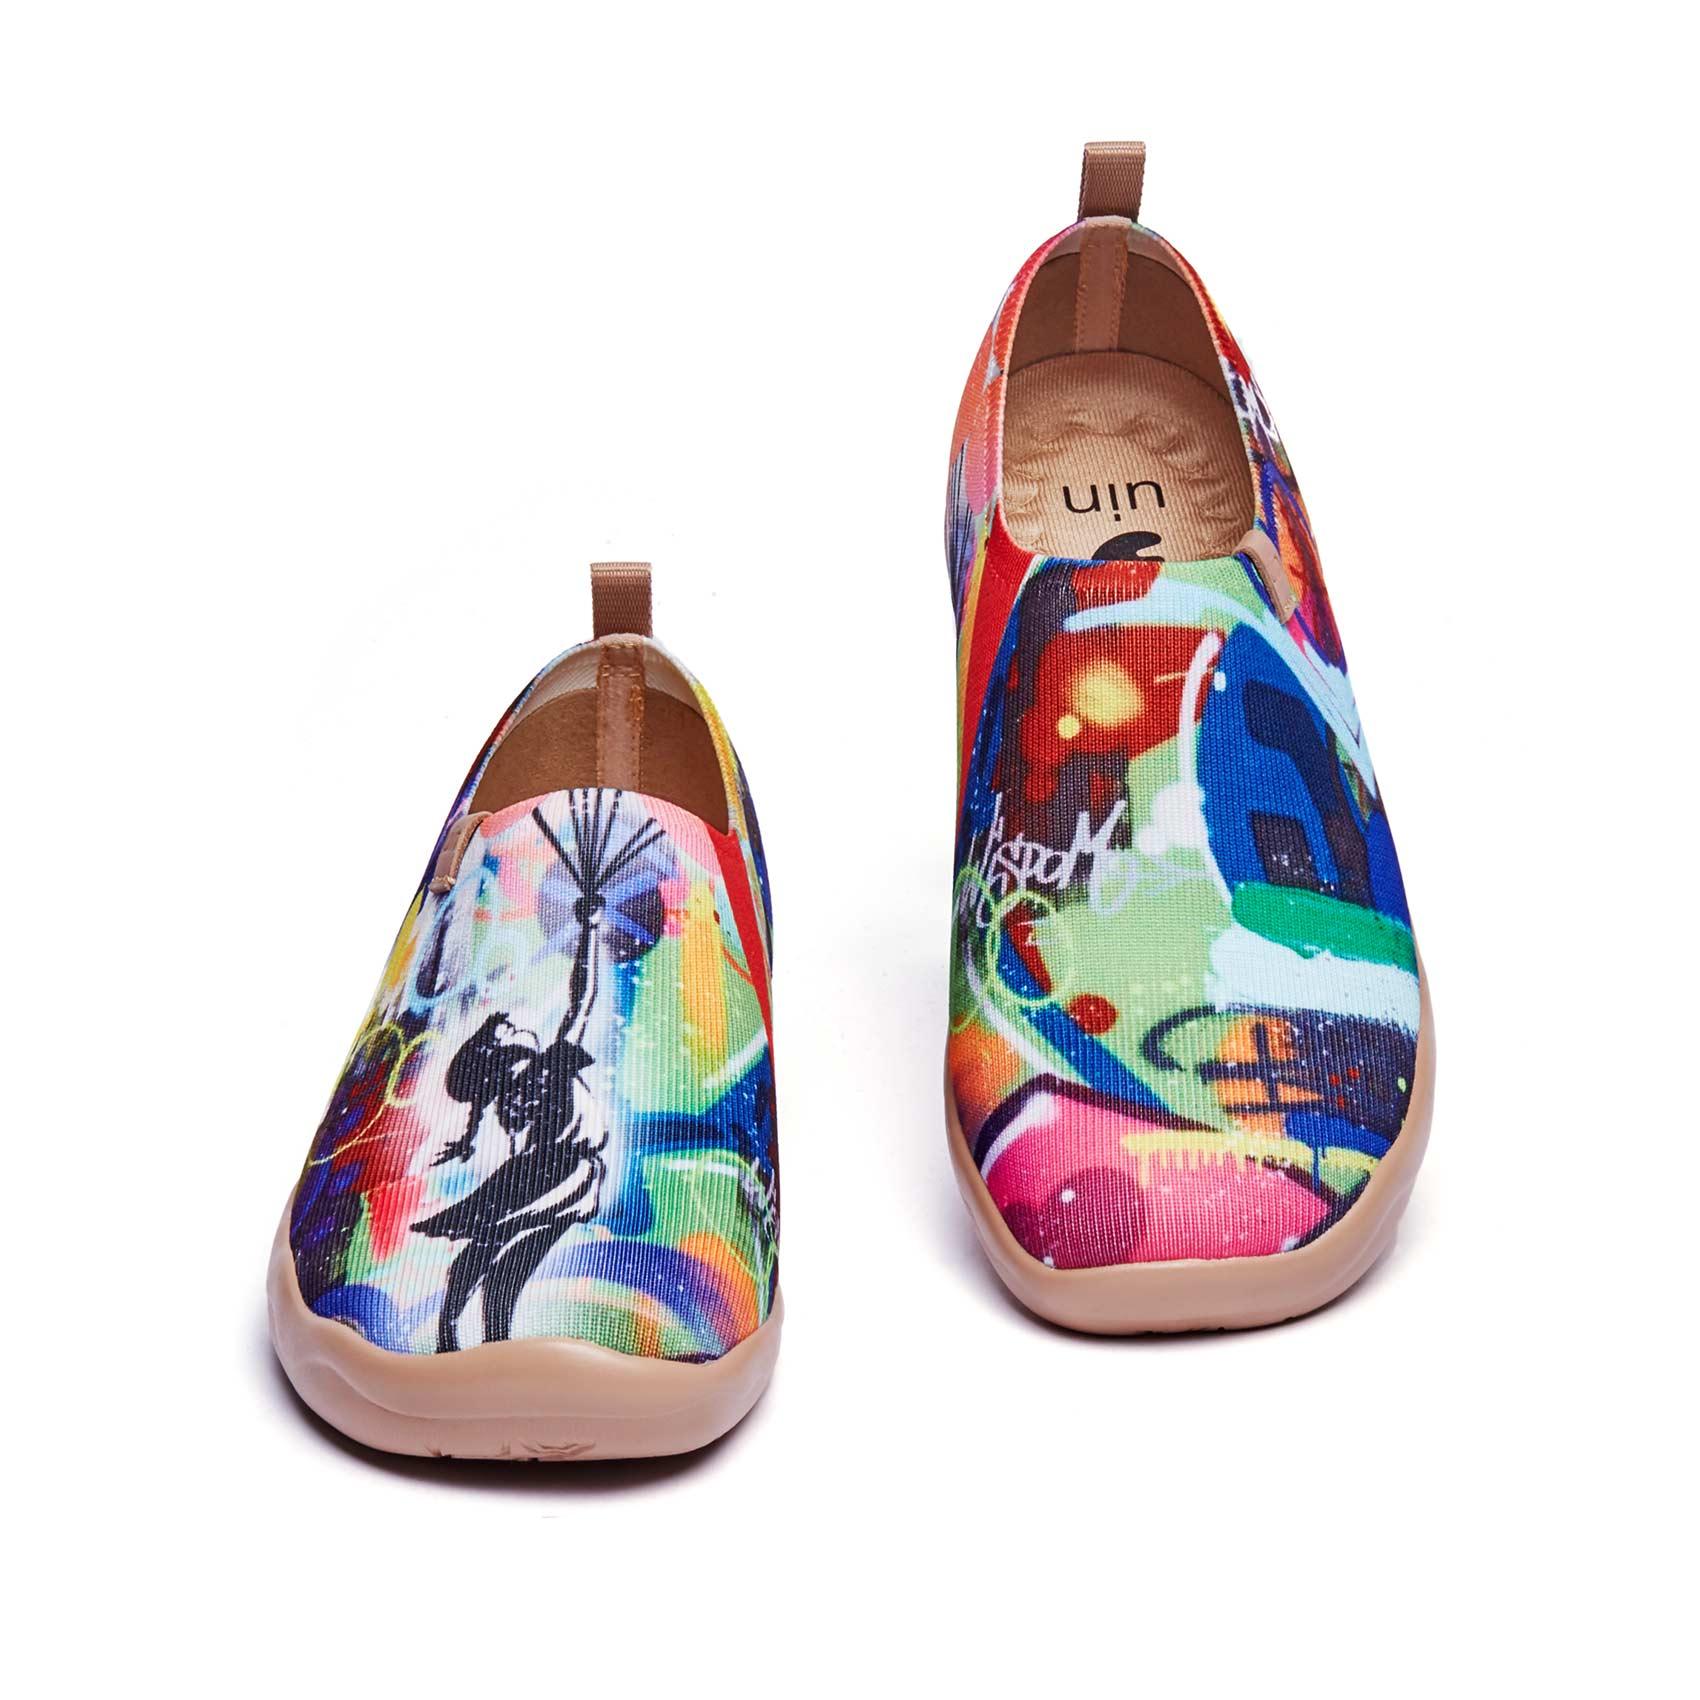 UIN-حذاء موكاسين نسائي خفيف الوزن ، حذاء كاجوال مريح للمشي ، حذاء سفر برسومات فنية بالزهور